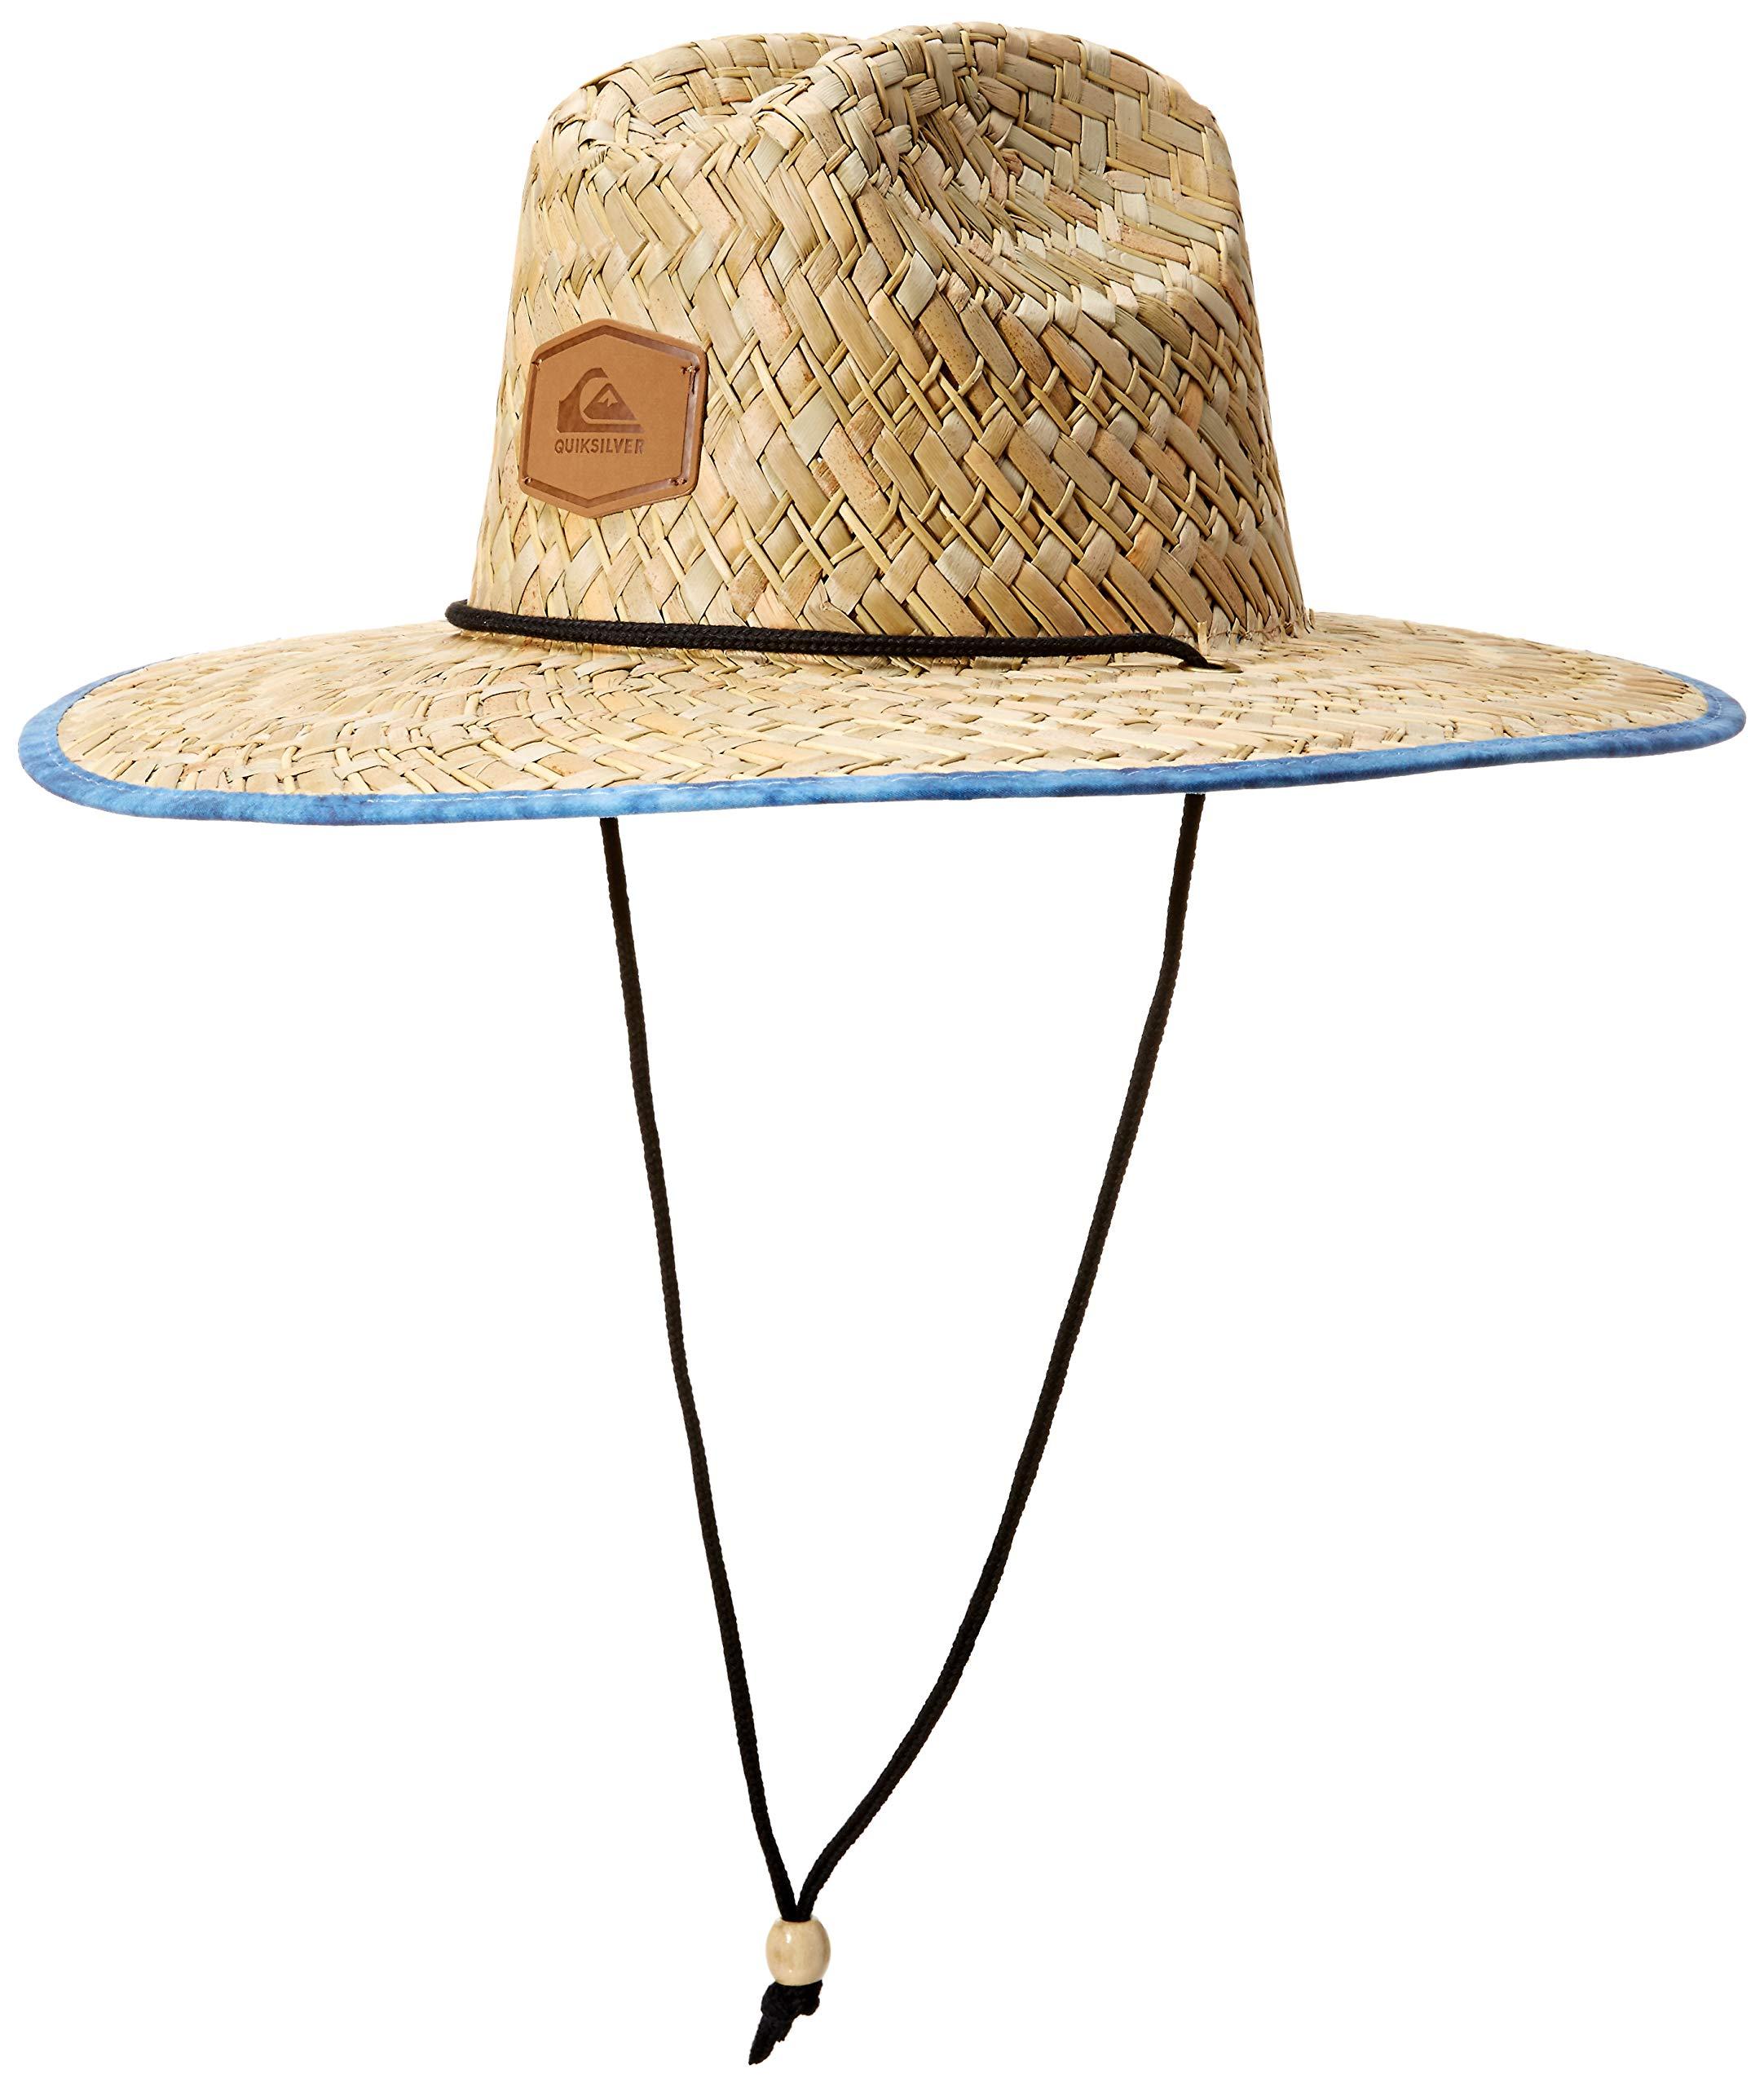 Quiksilver Men's Outsider Hat, Navy Blazer, L/XL